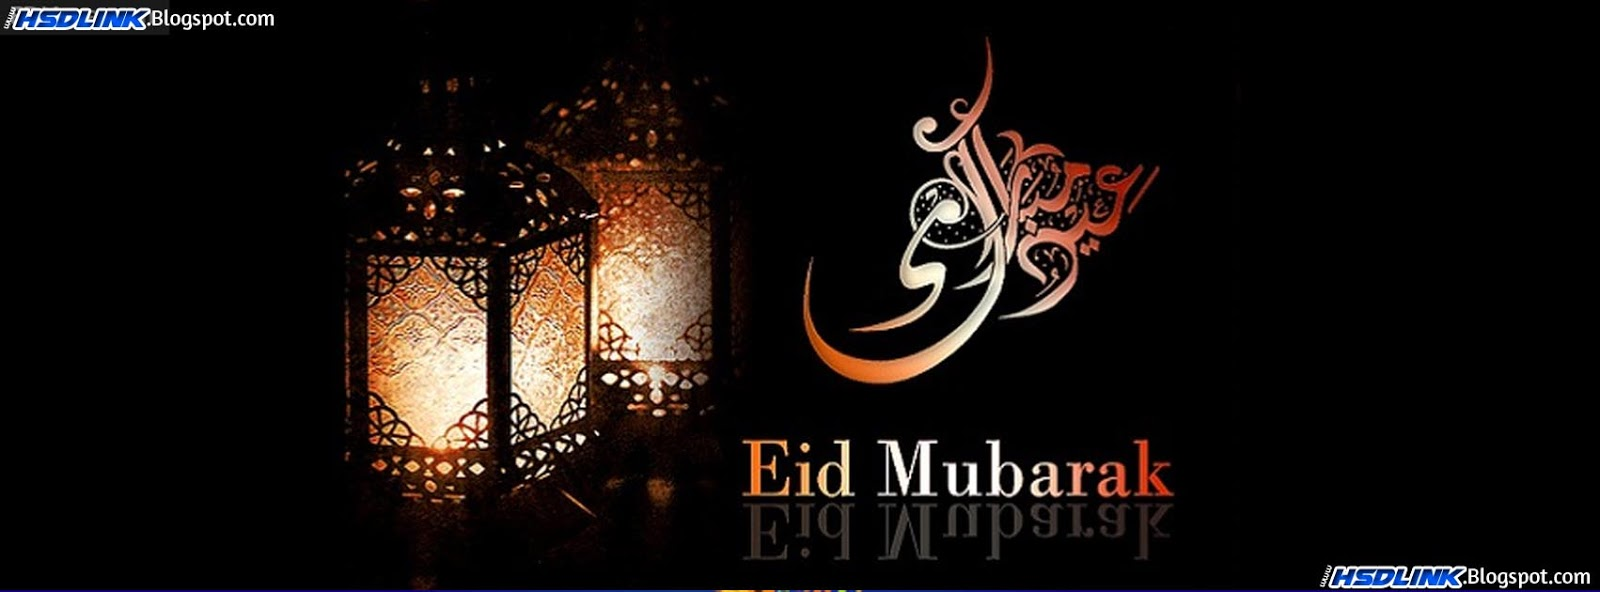 Eid mubarak cards free download.